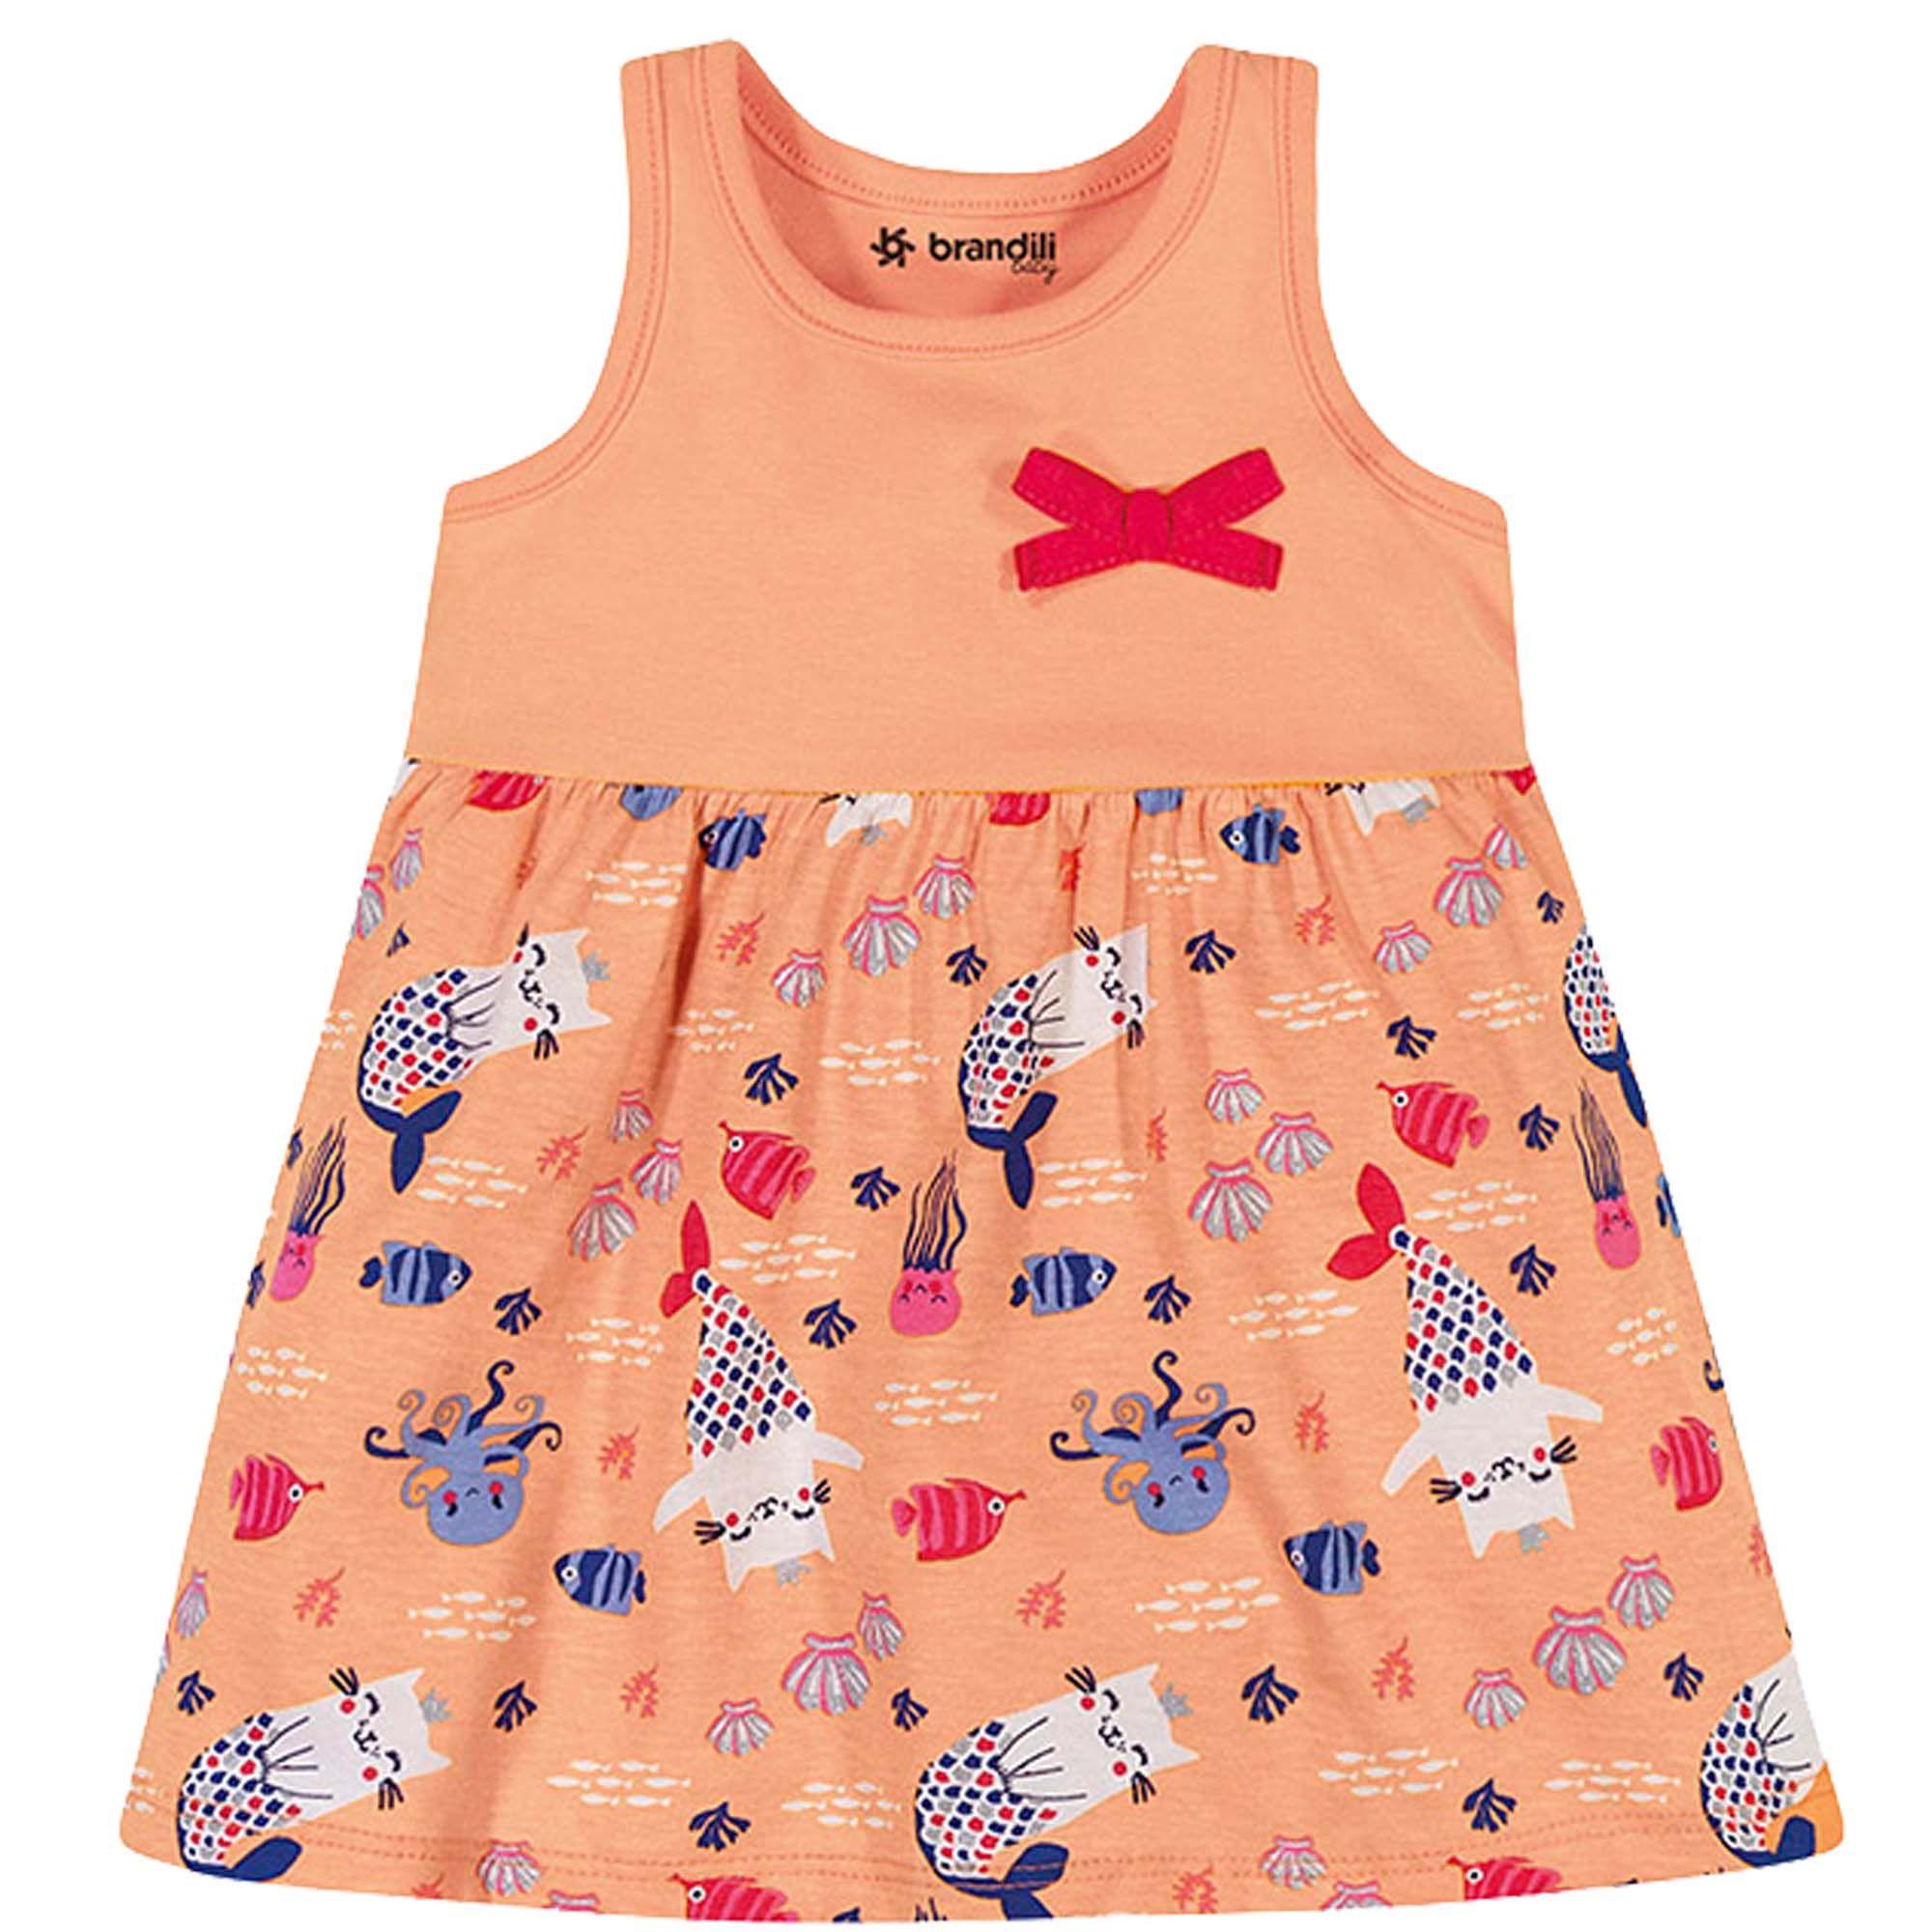 Vestido Brandili Baby Meia Malha - P ao G